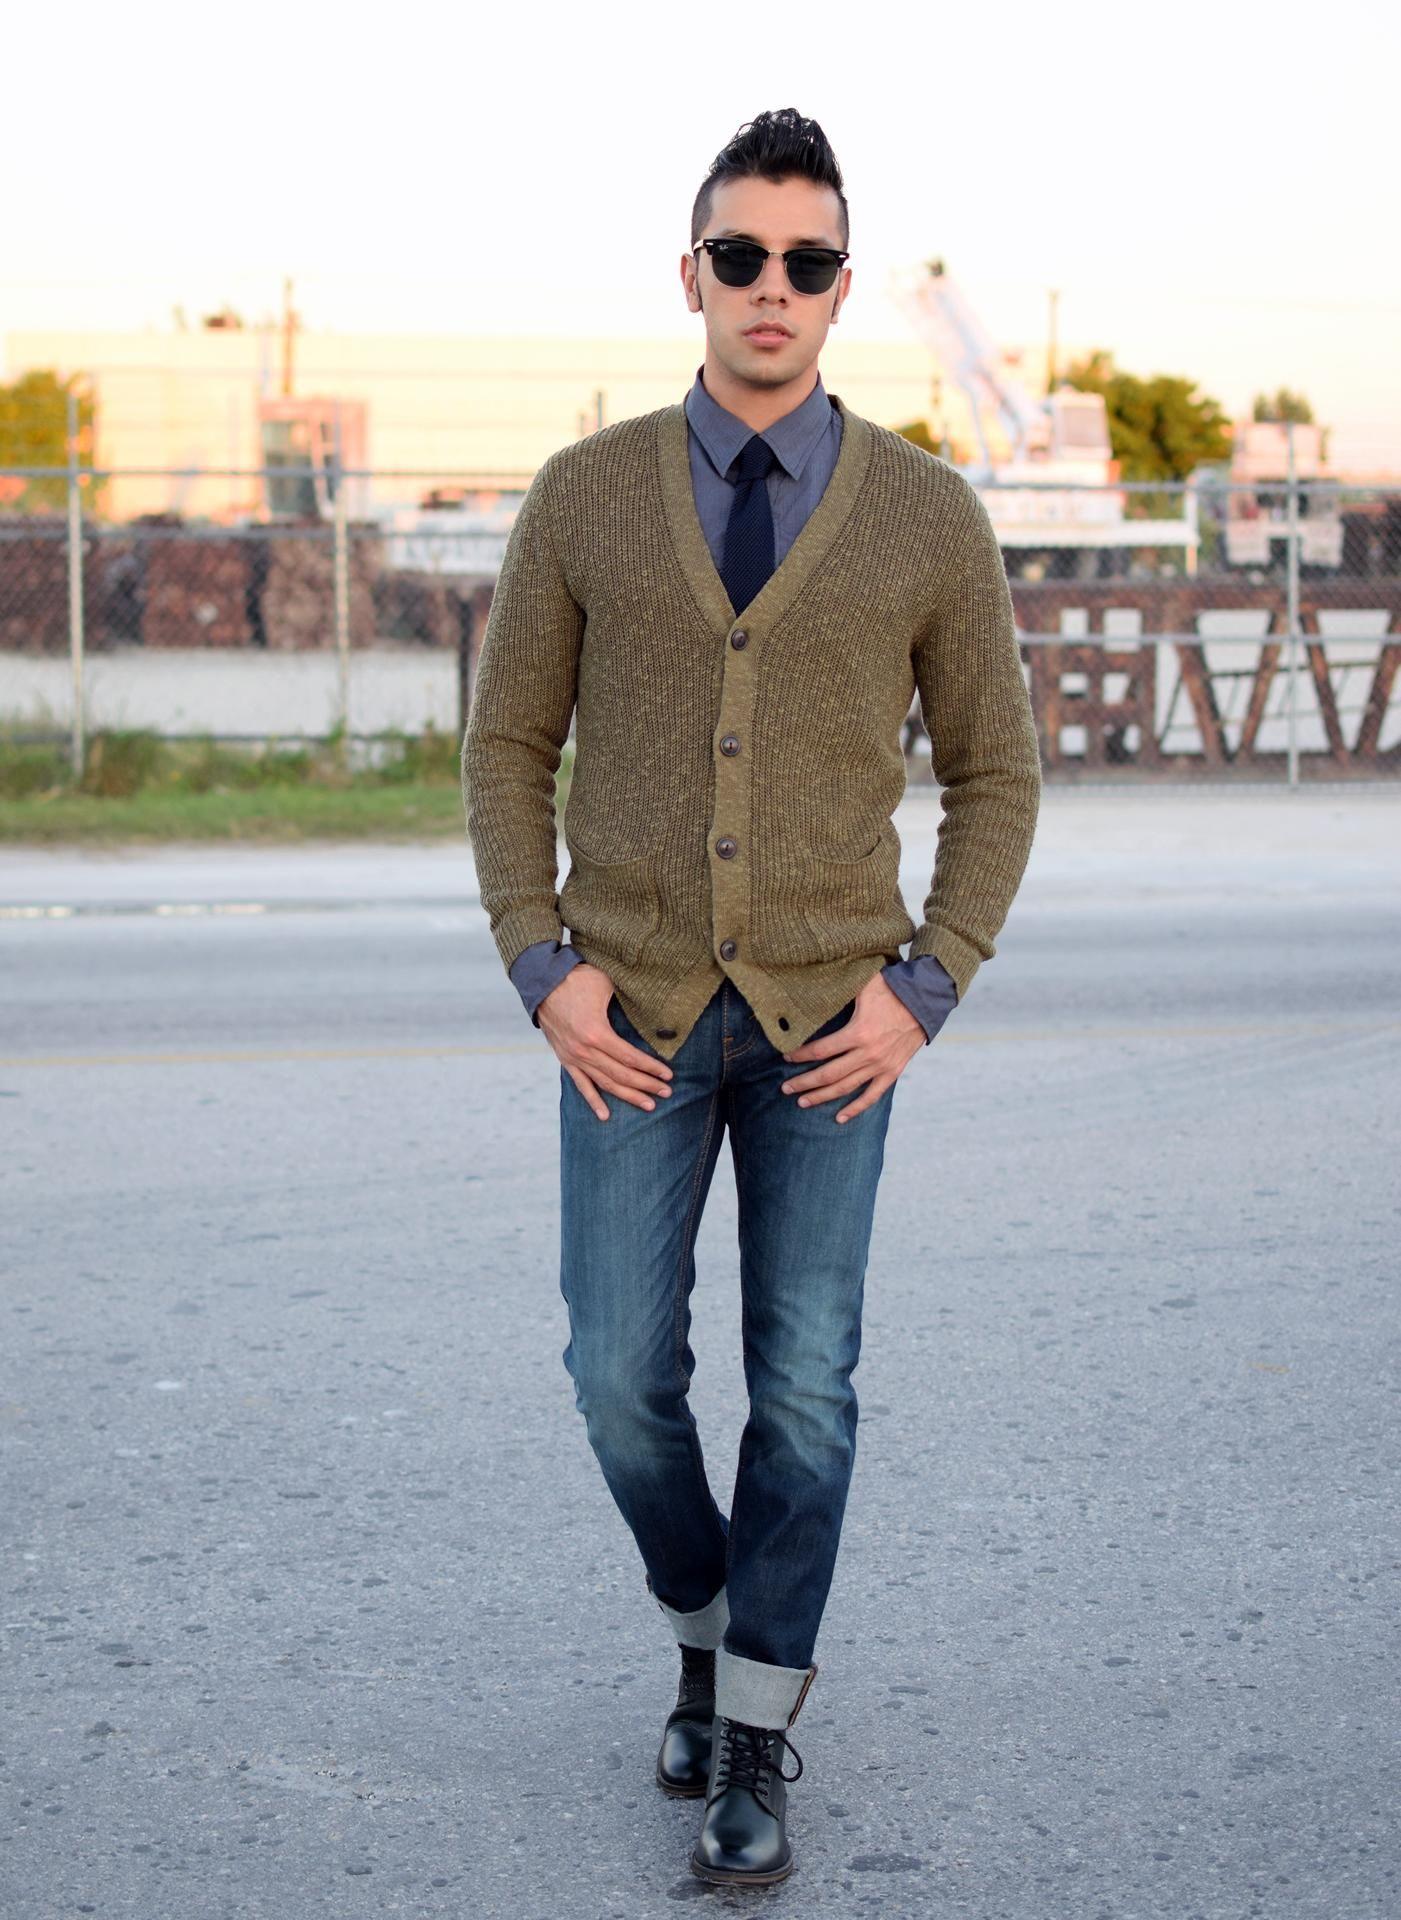 Men\'s Olive Cardigan, Navy Dress Shirt, Navy Jeans, Black Leather ...